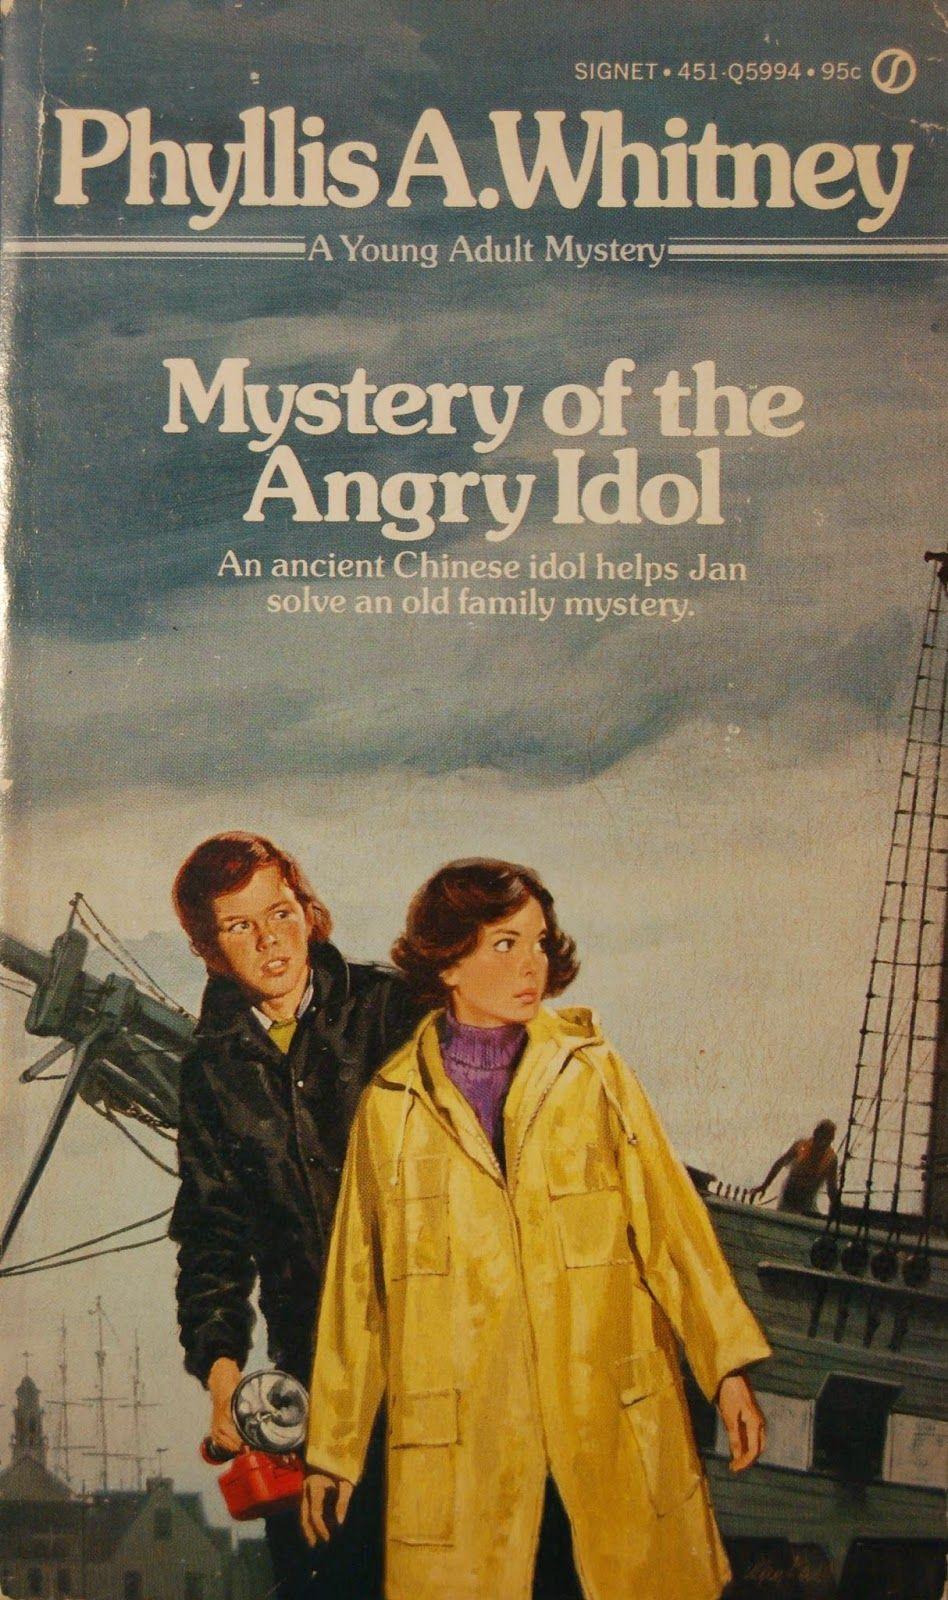 The idol vintage romance